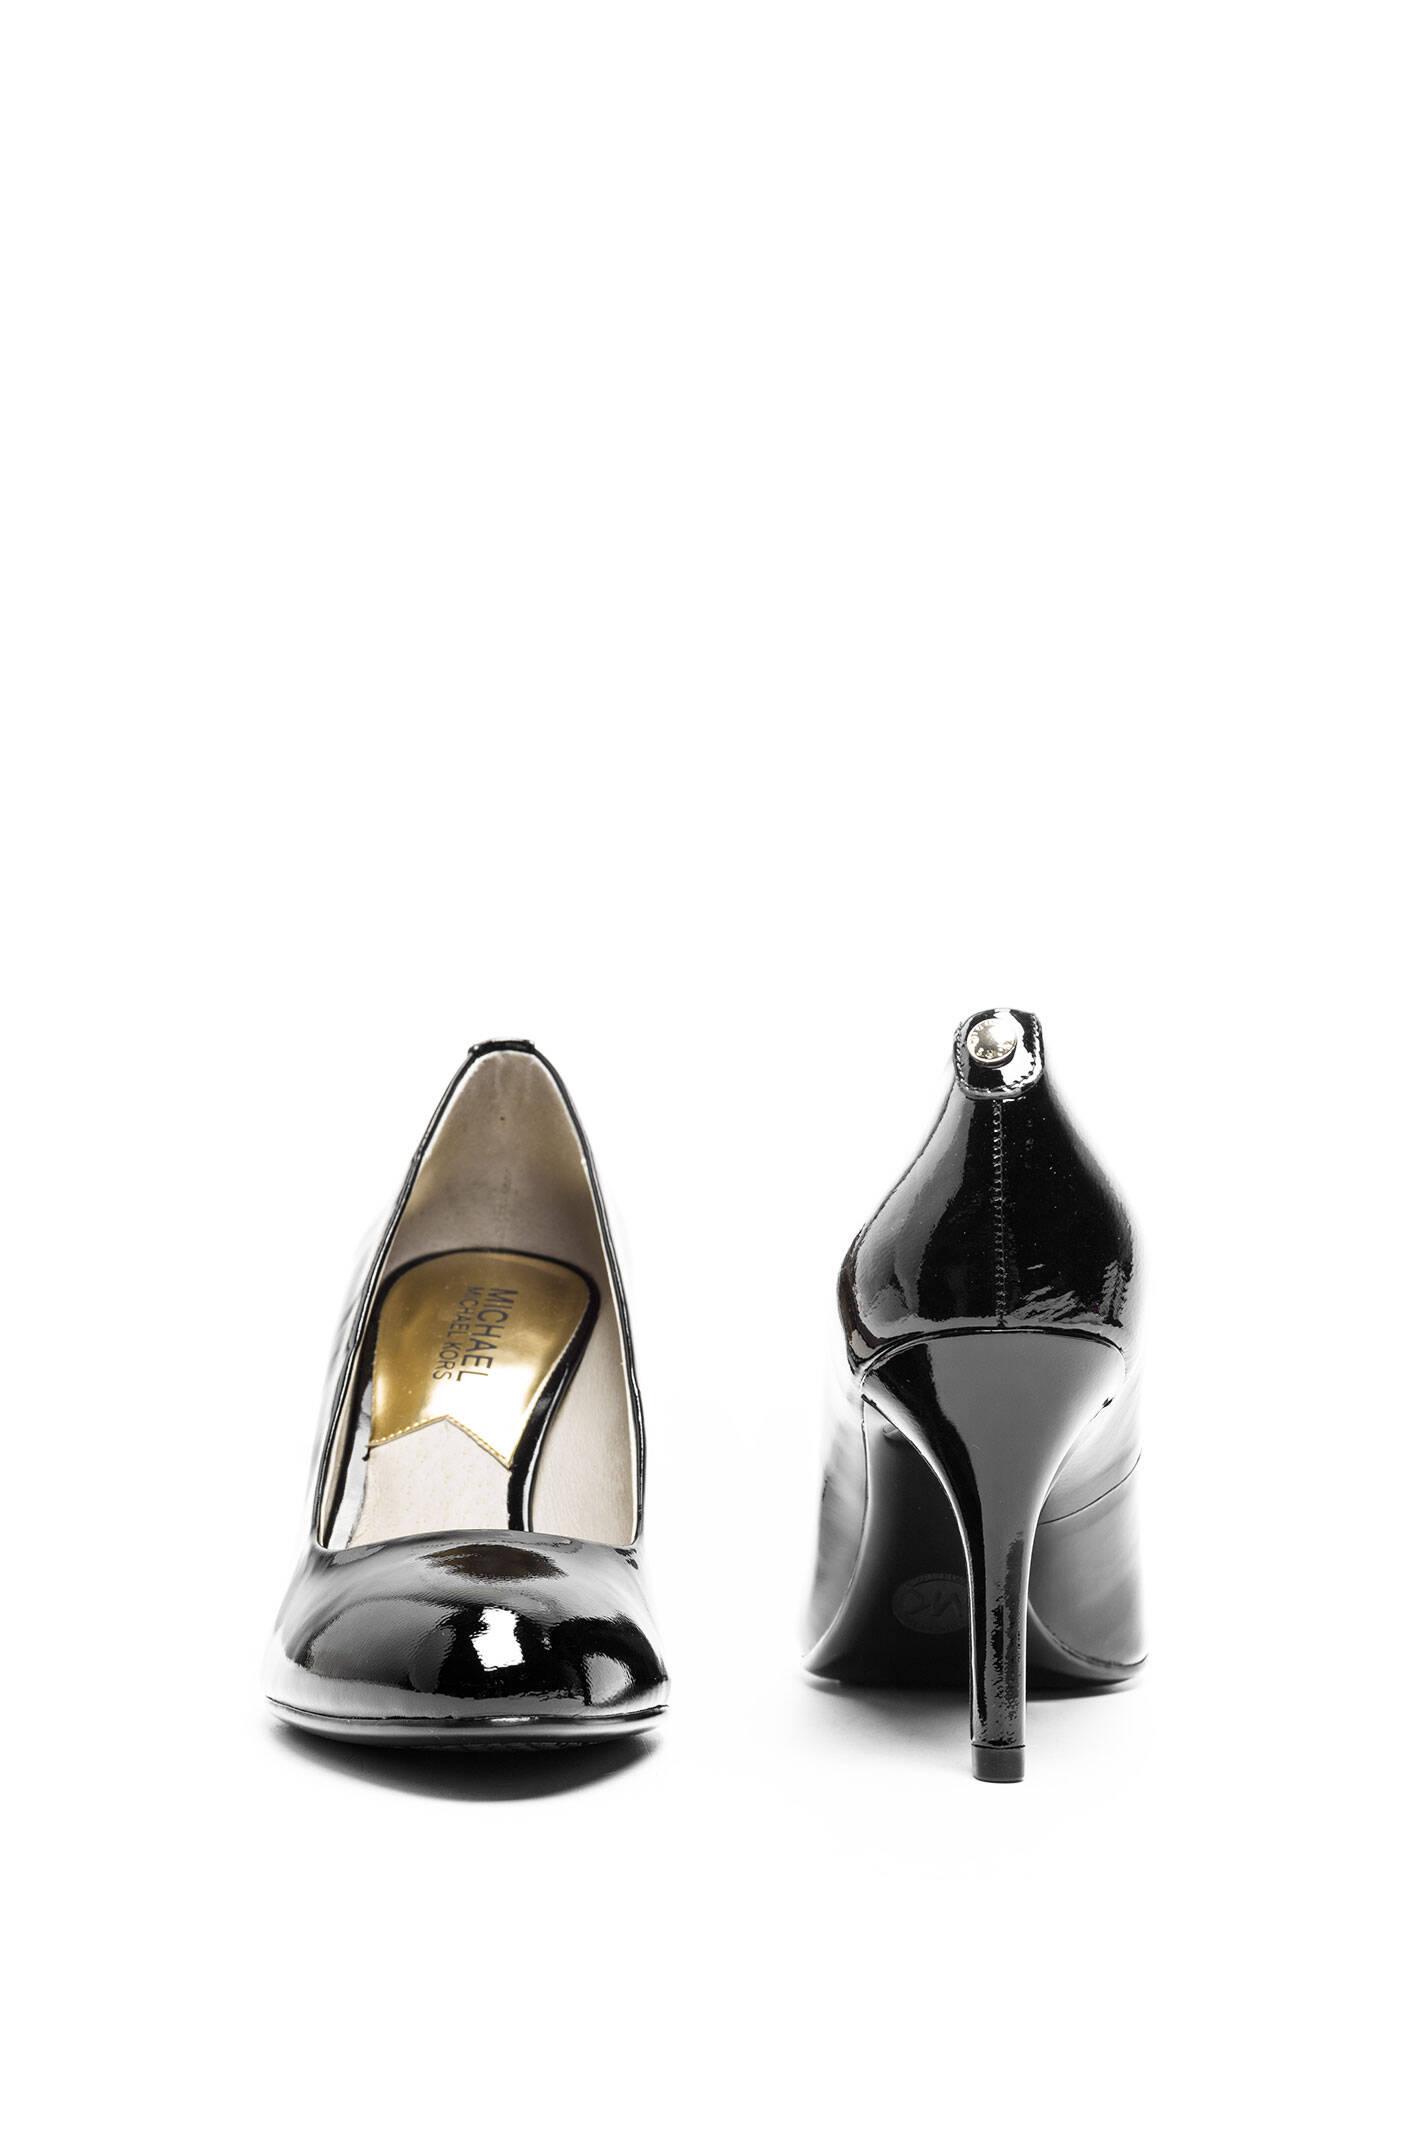 mk flex pumps michael kors black shoes. Black Bedroom Furniture Sets. Home Design Ideas